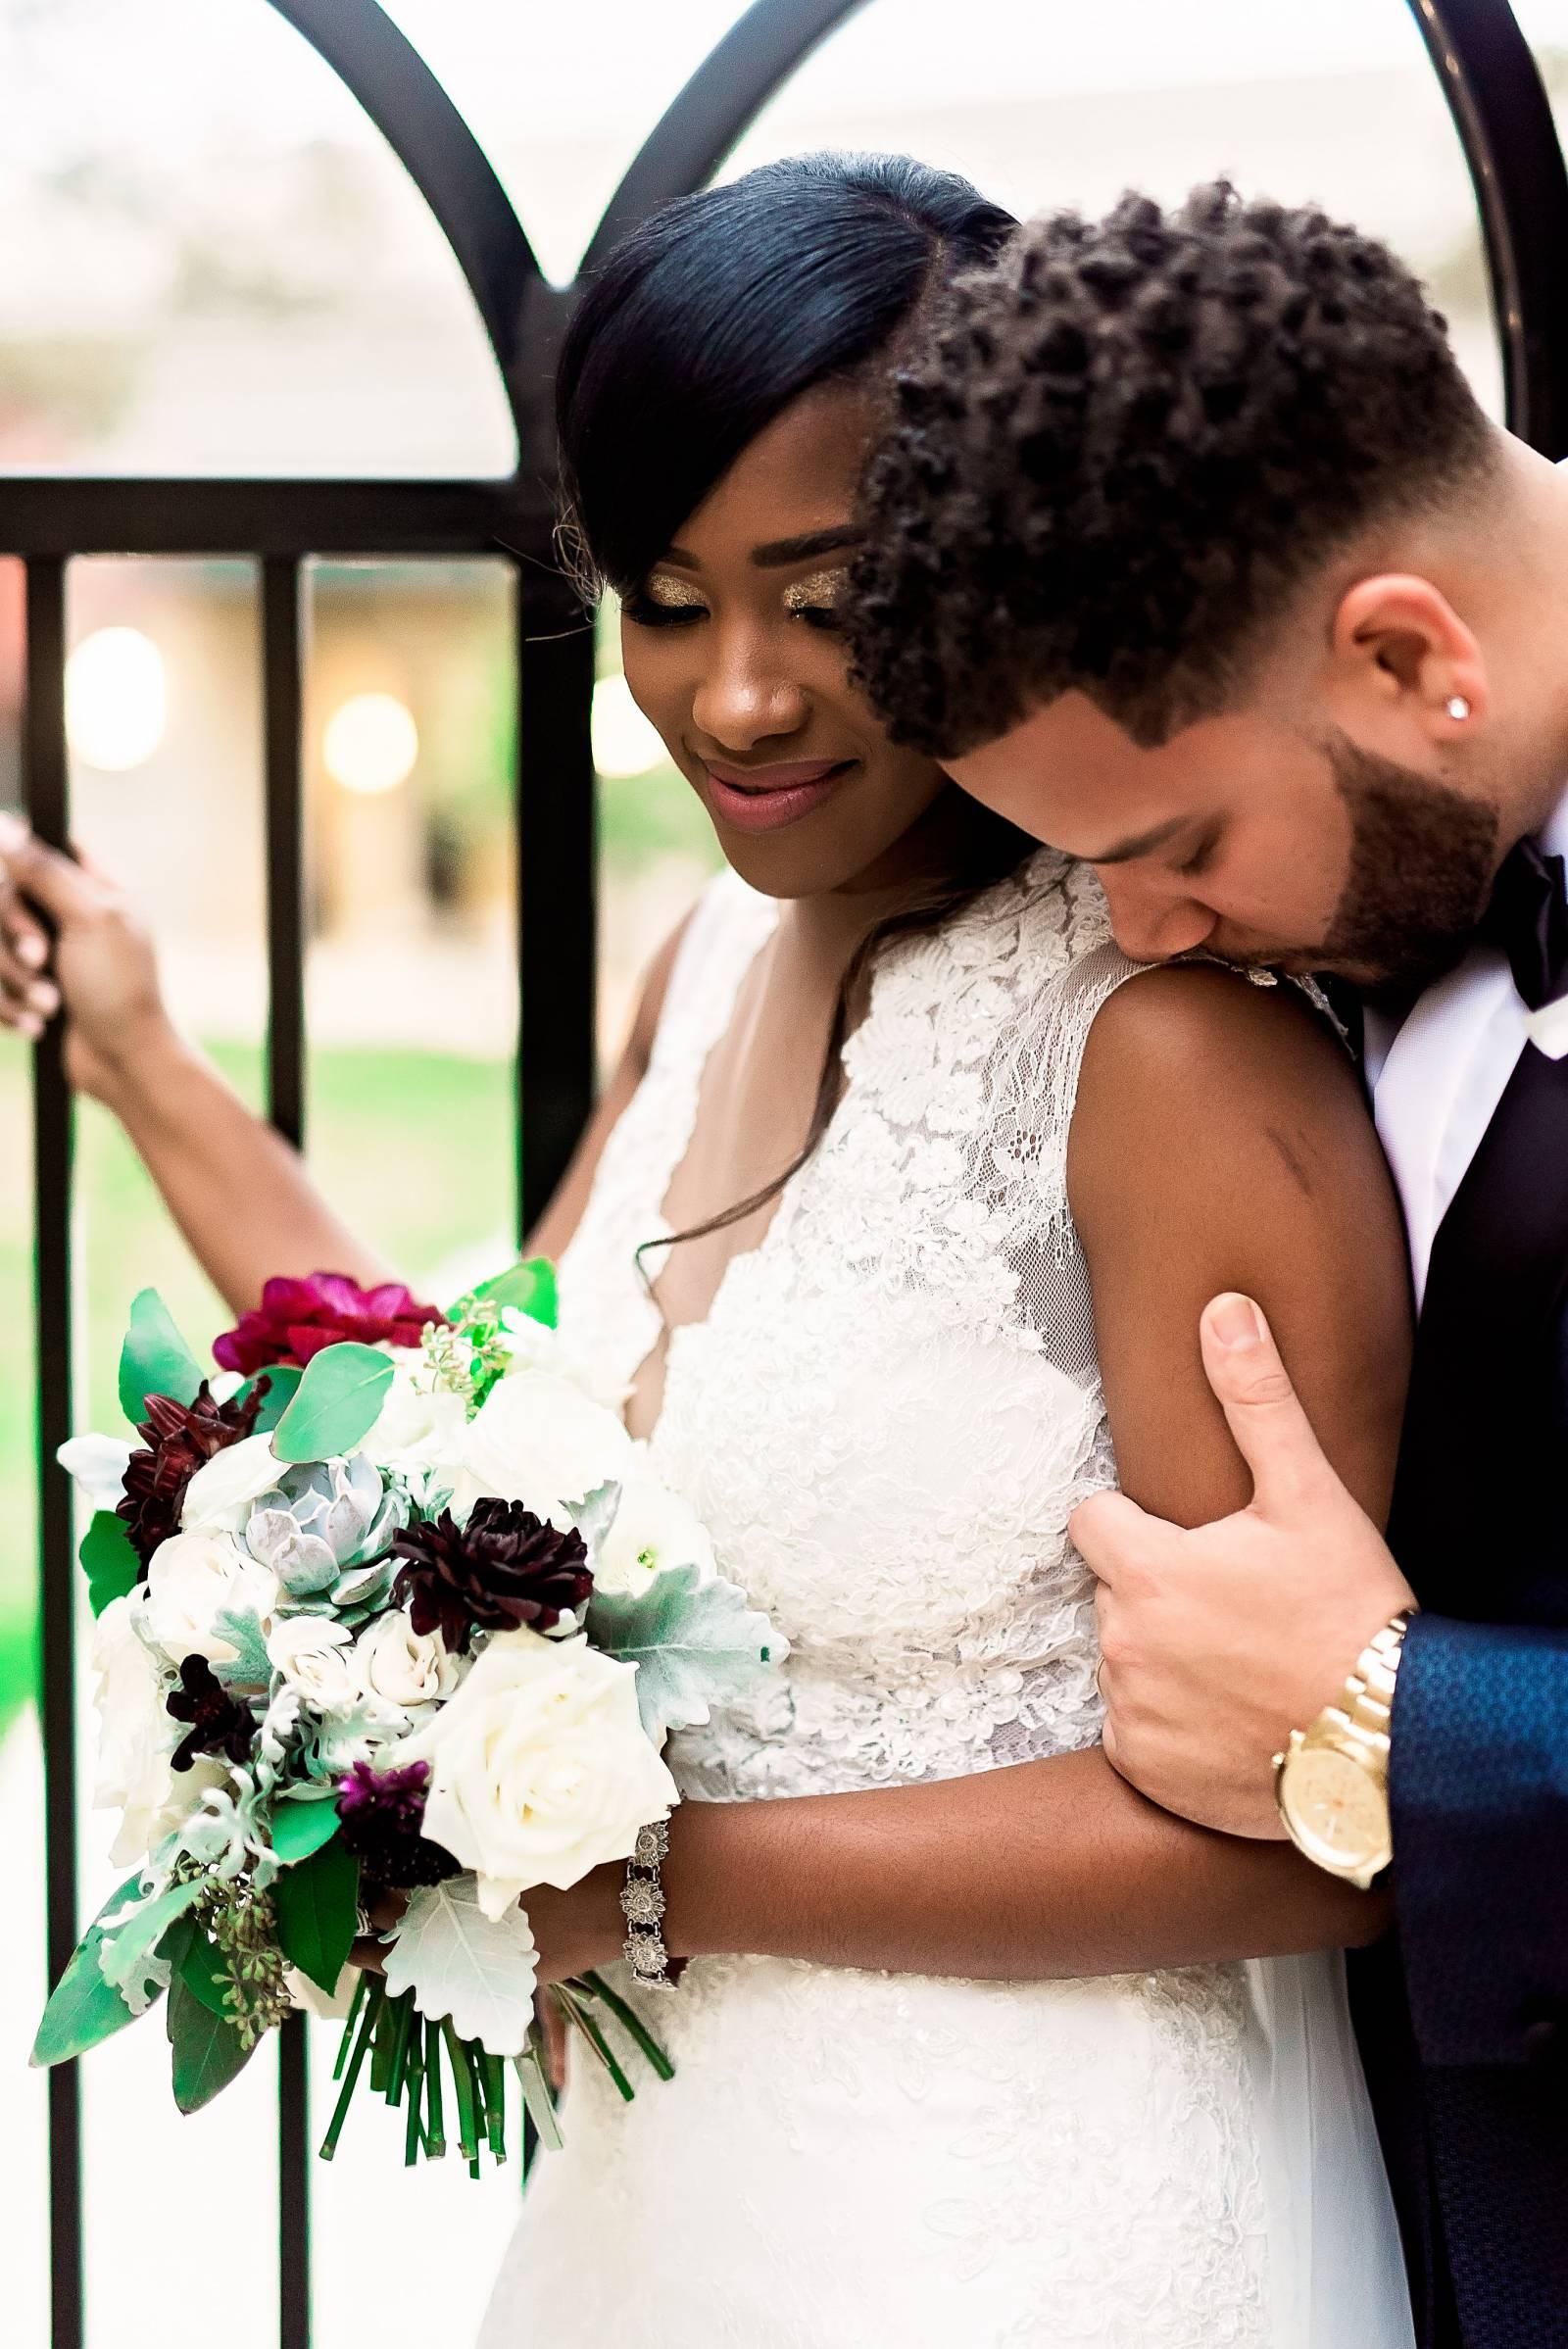 DeShana + Darryl Featured on the Black Bride - 2.0 - 11.jpg